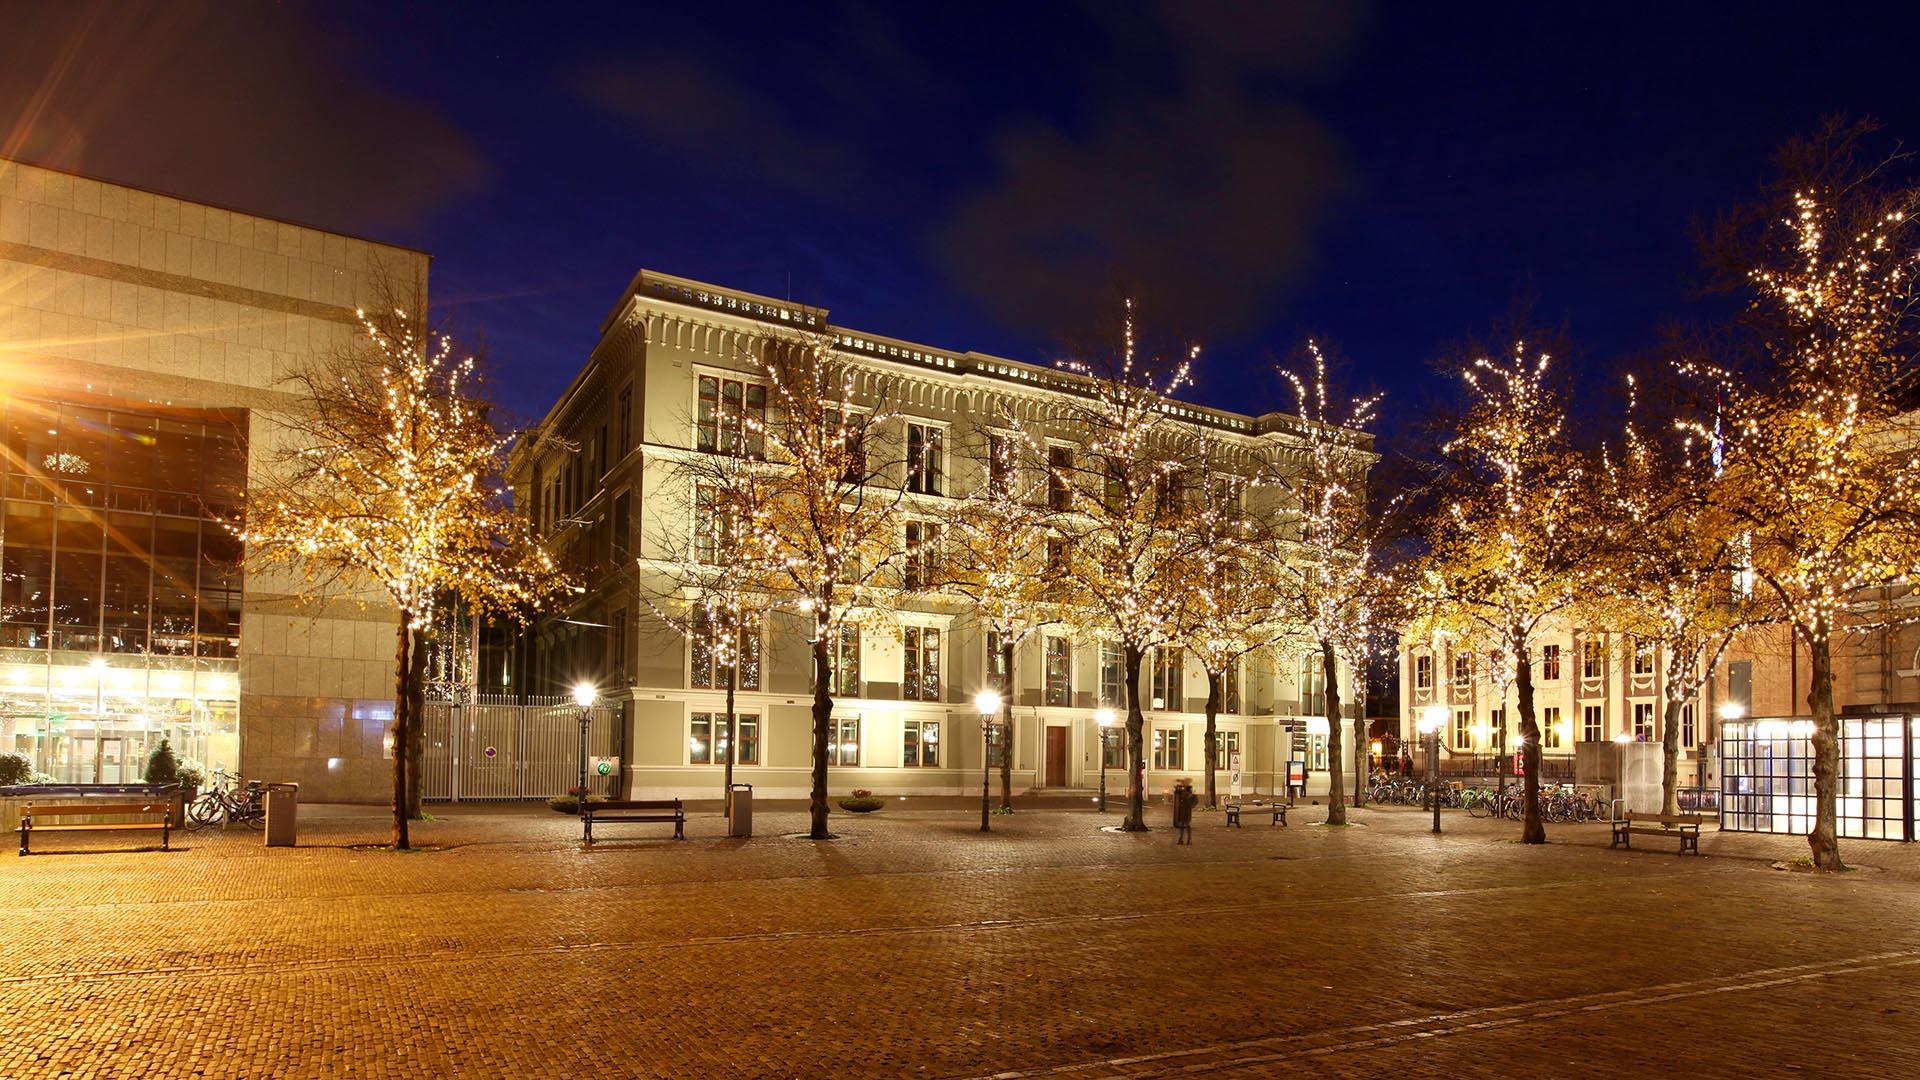 verlichting Plein Den Haag - ipv Delft creatieve ingenieurs